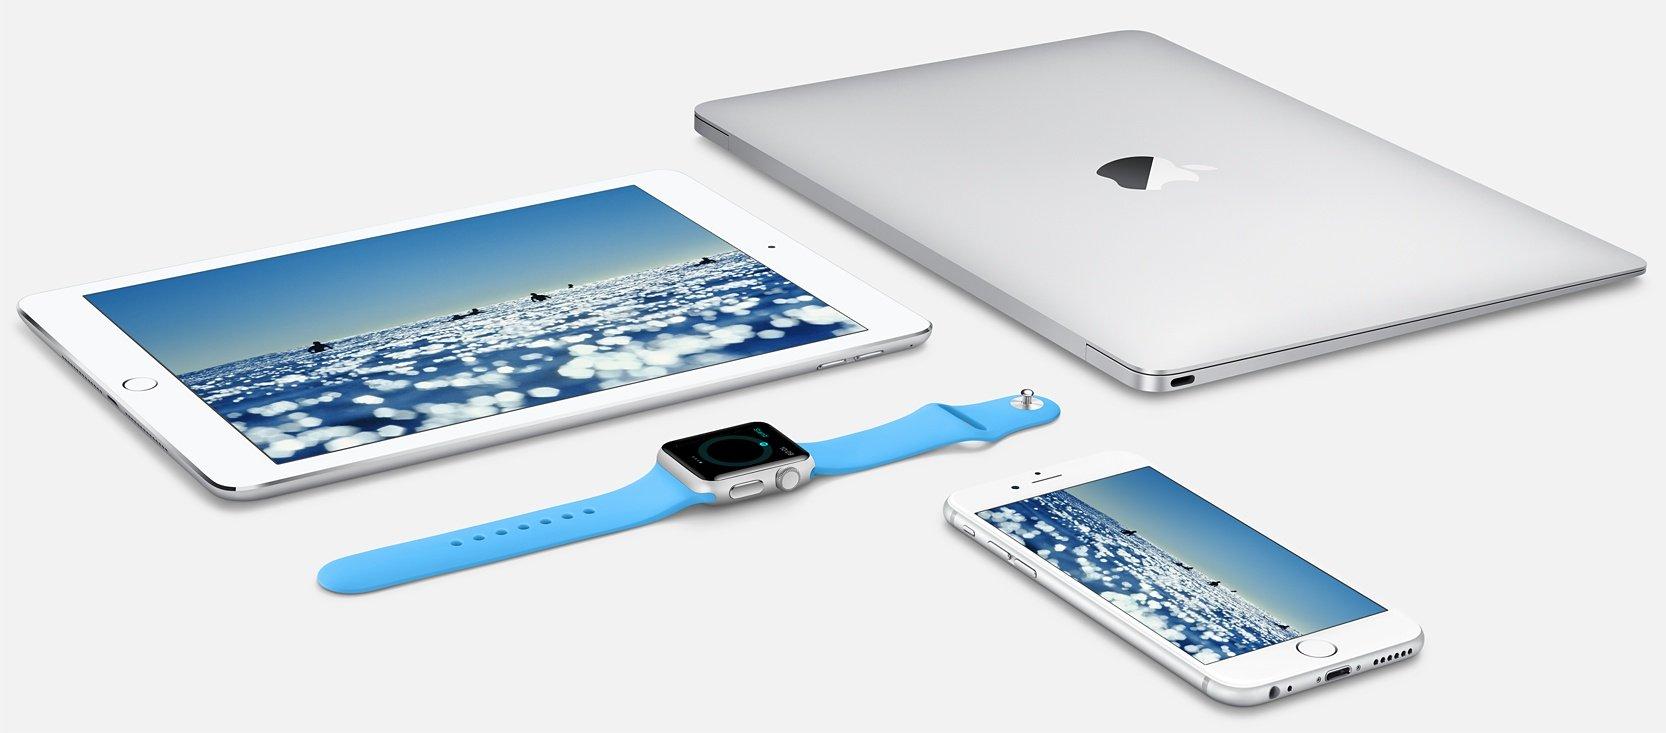 Apple produits - Mac OS X 10.11.5, watchOS 2.2.1 (Apple Watch) & tvOS 9.2.1 (Apple TV) bêtas 1 disponibles